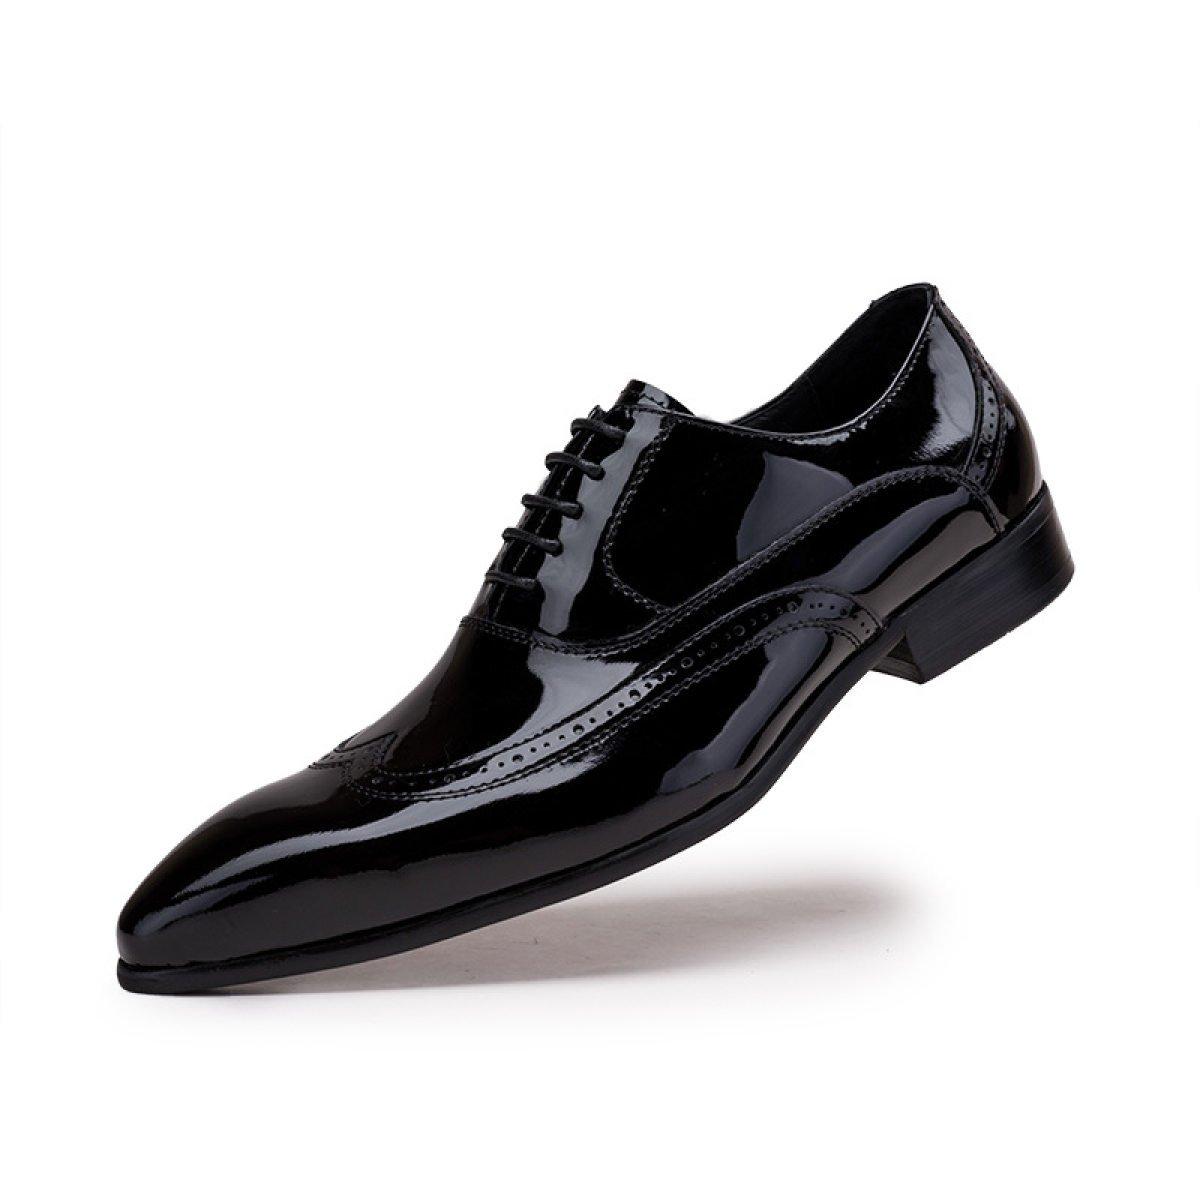 GRRONG Zapatos De Cuero Para Hombres Negocios Vestido Formal Puntiagudo 40 EU|Black